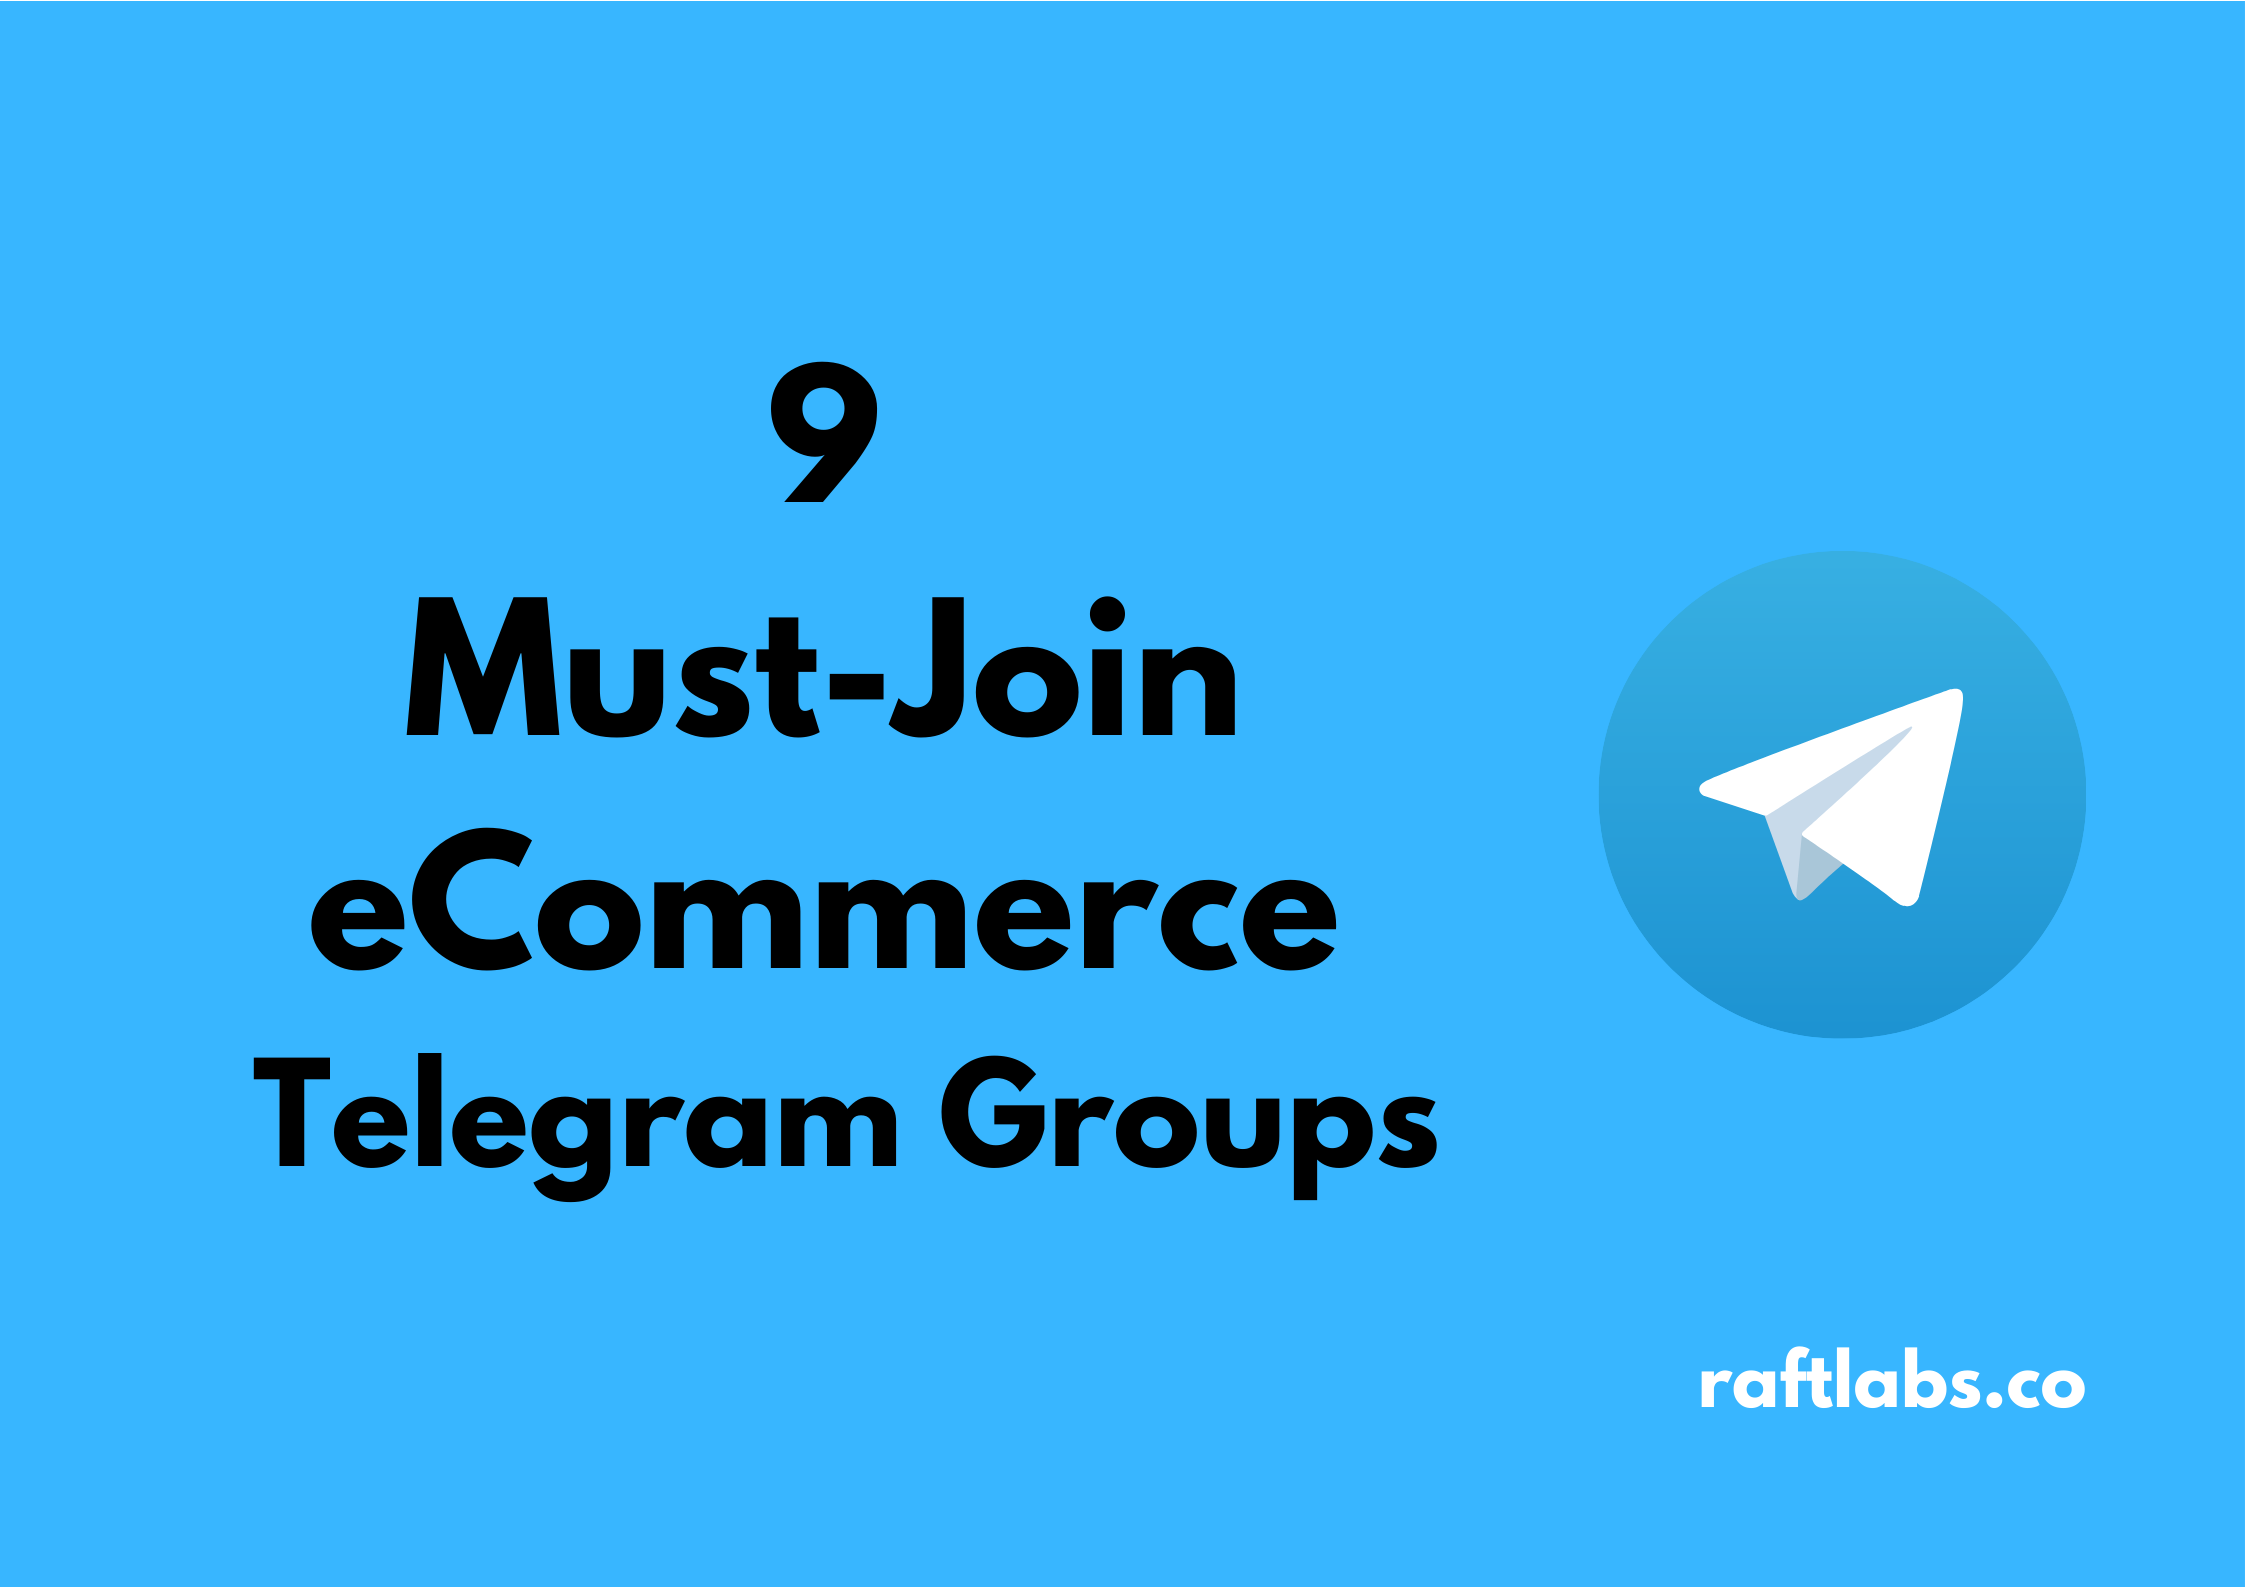 Handpicked list of best eCommerce Telegram Groups| raftlabs